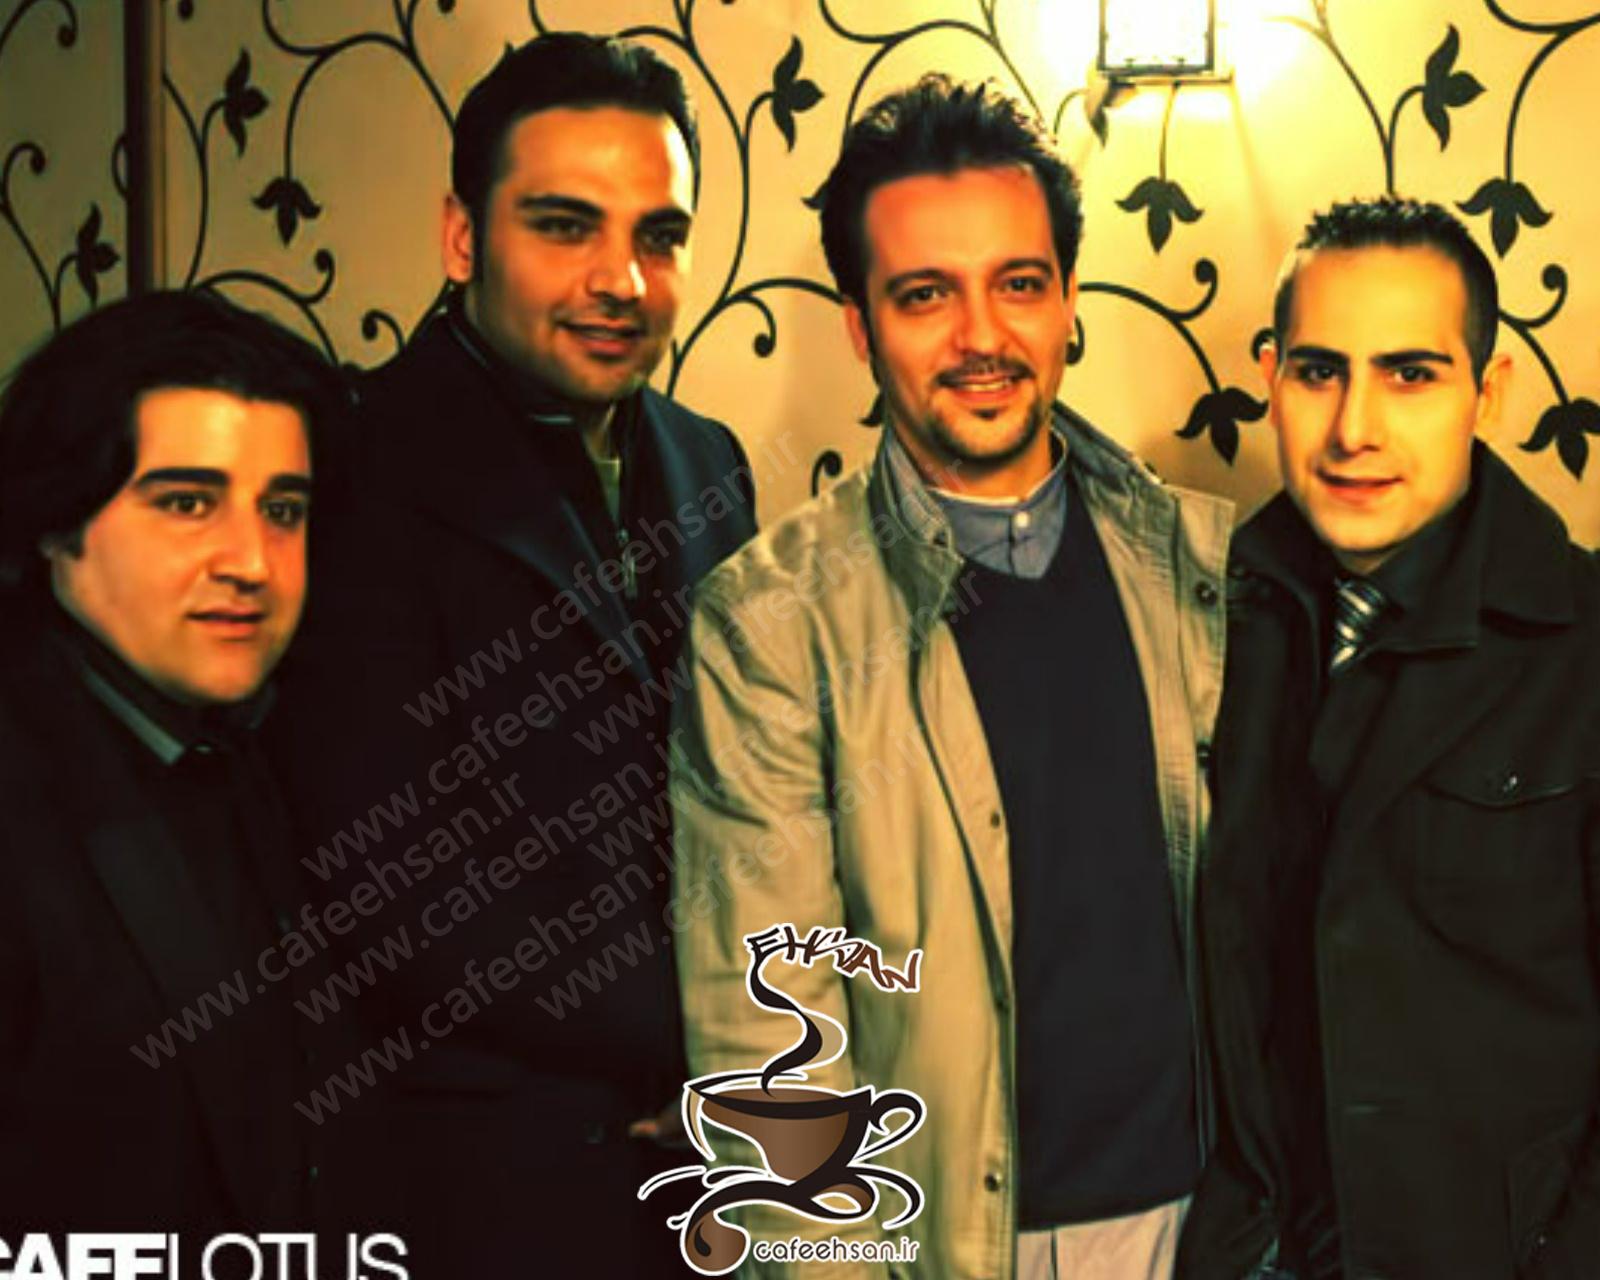 http://s4.picofile.com/file/7896359886/Ghadimi_cafeehsan_8_.jpg